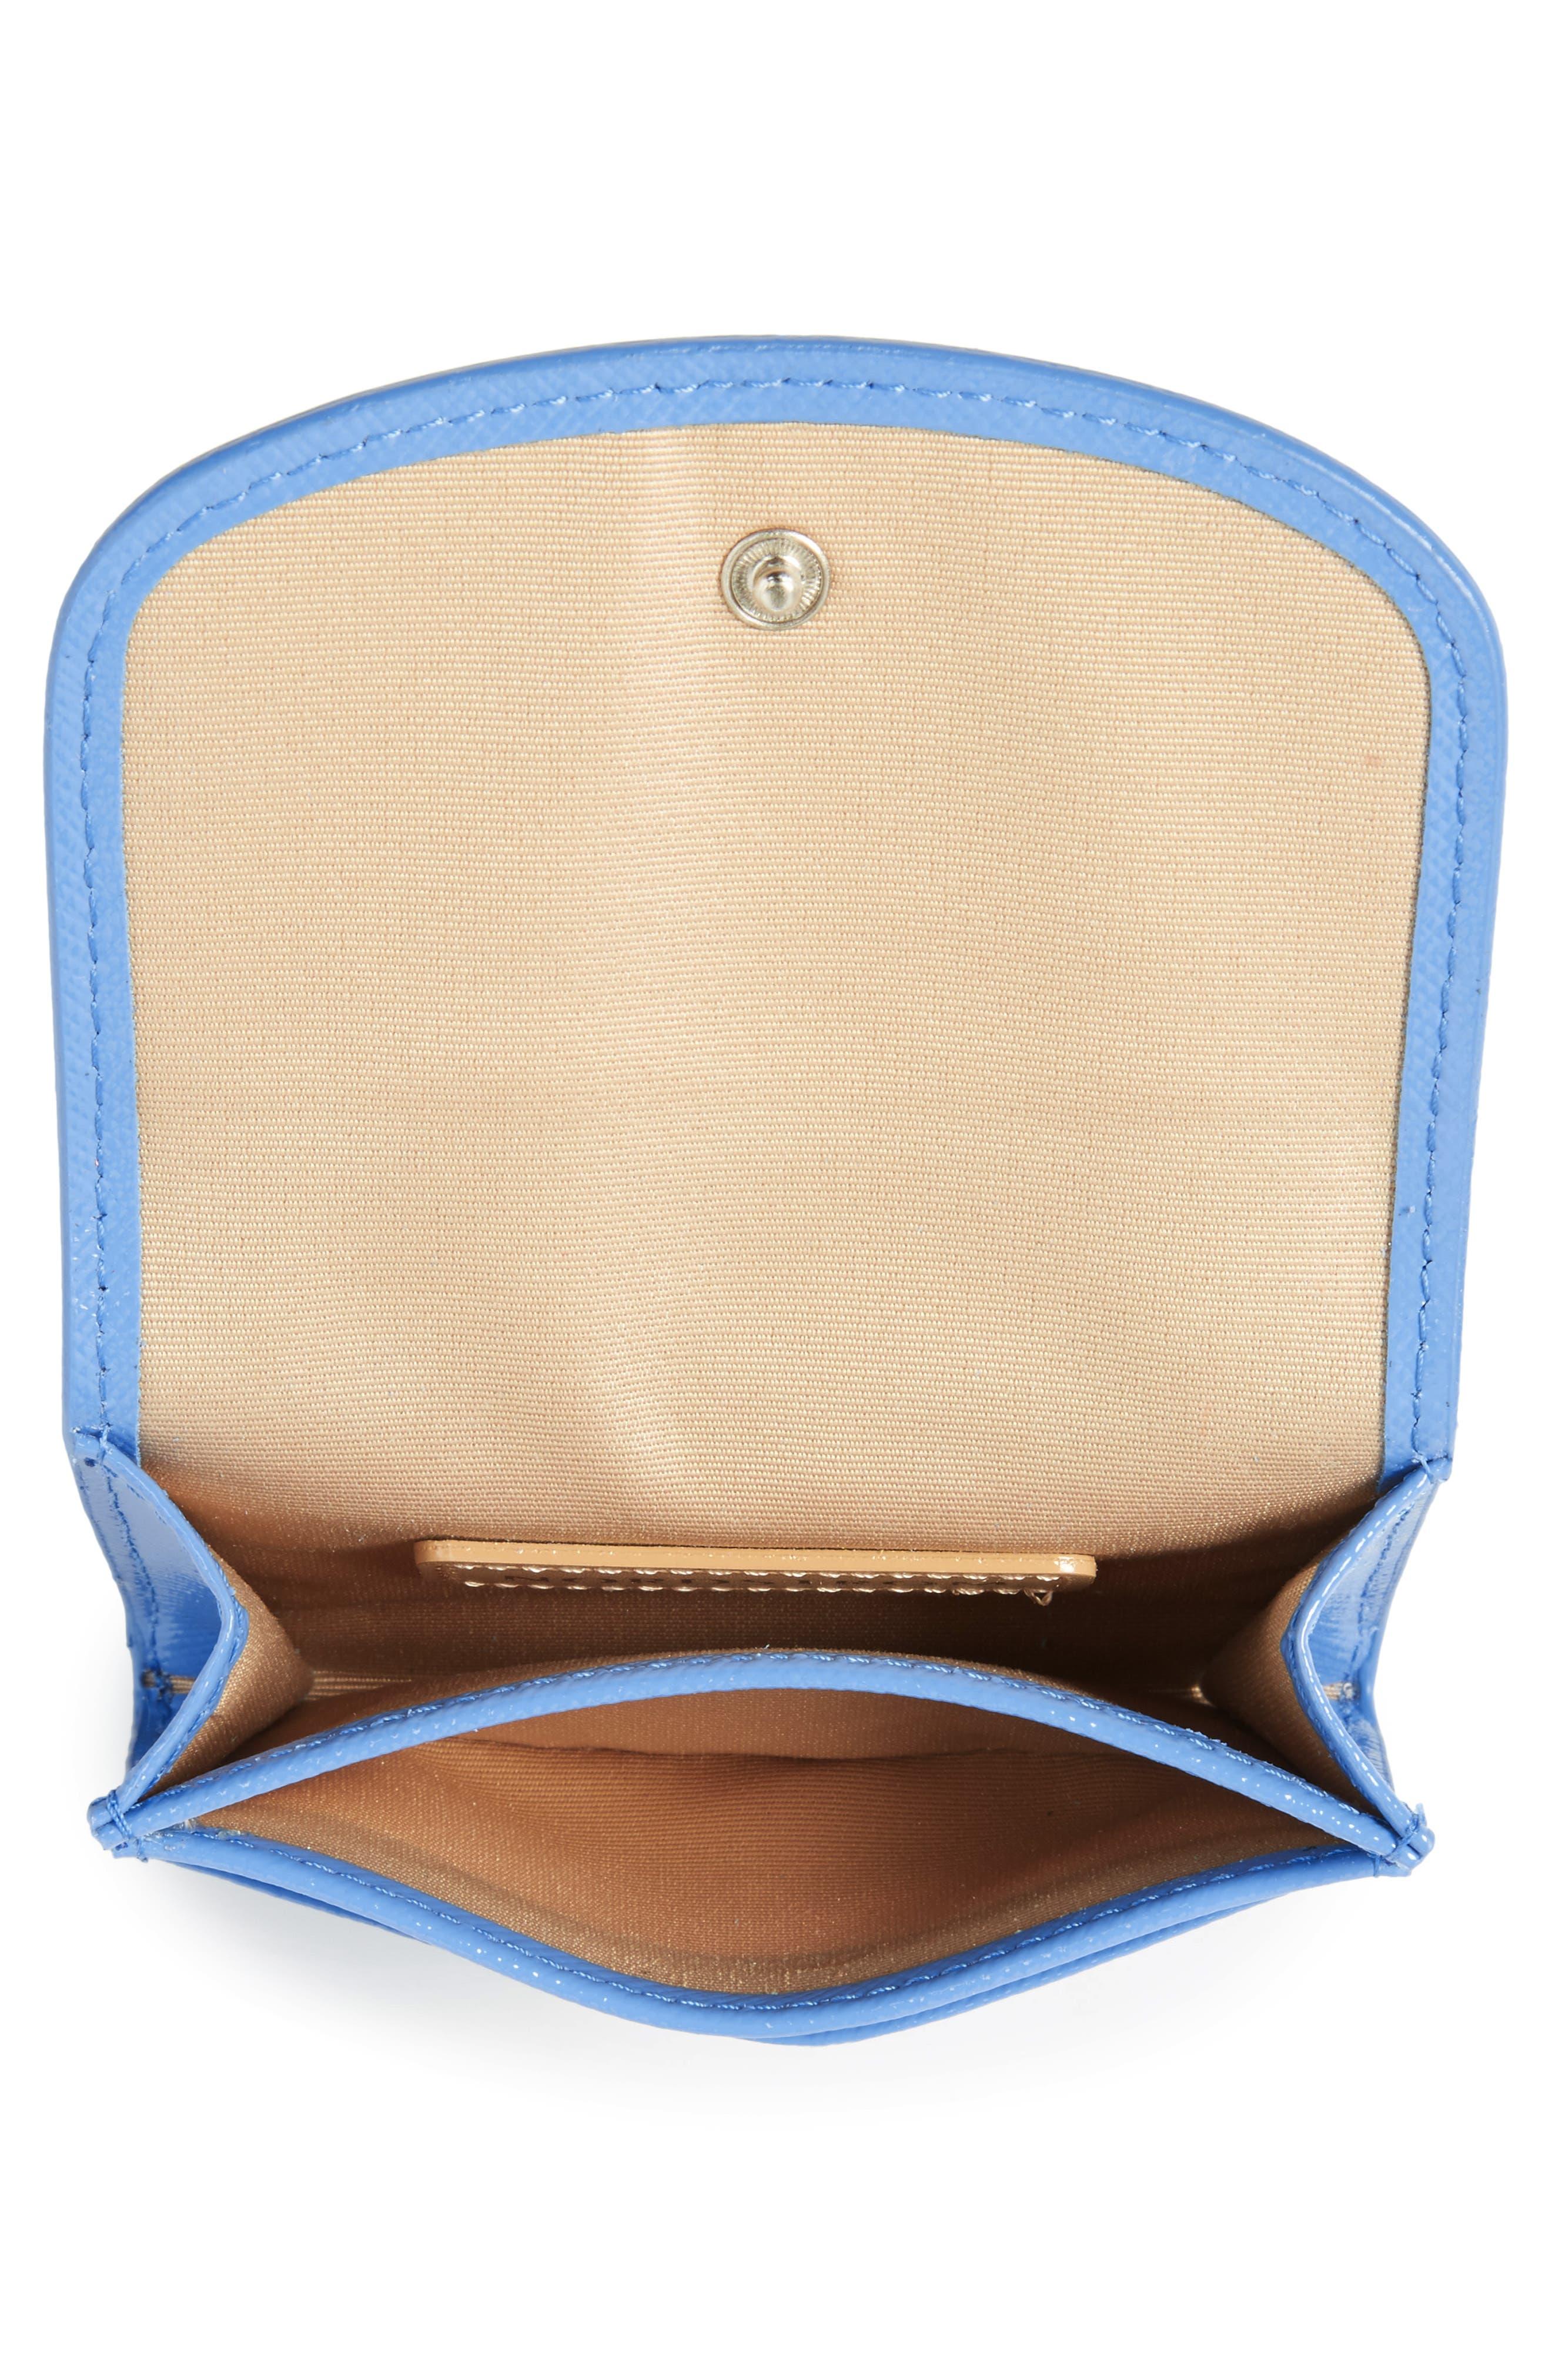 Leather Card Holder,                             Alternate thumbnail 2, color,                             Blue Regatta